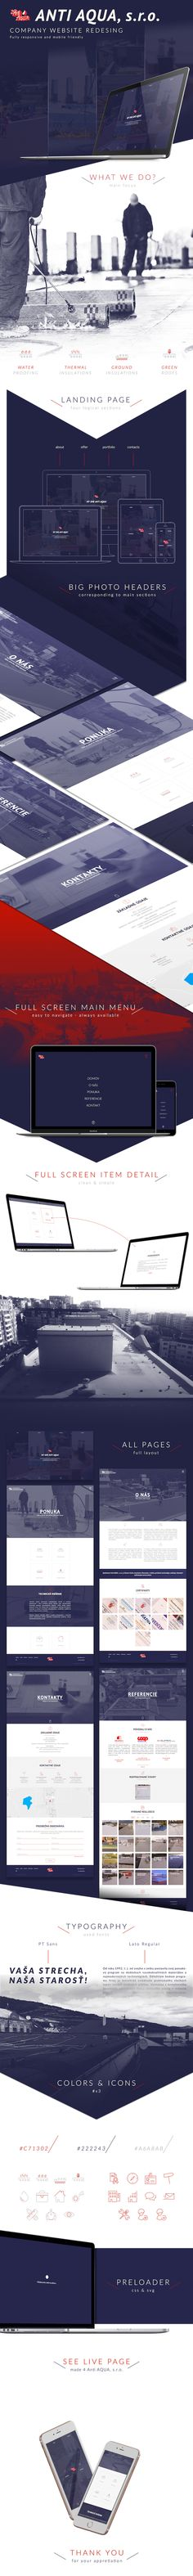 Anti AQUA Web Design Concept